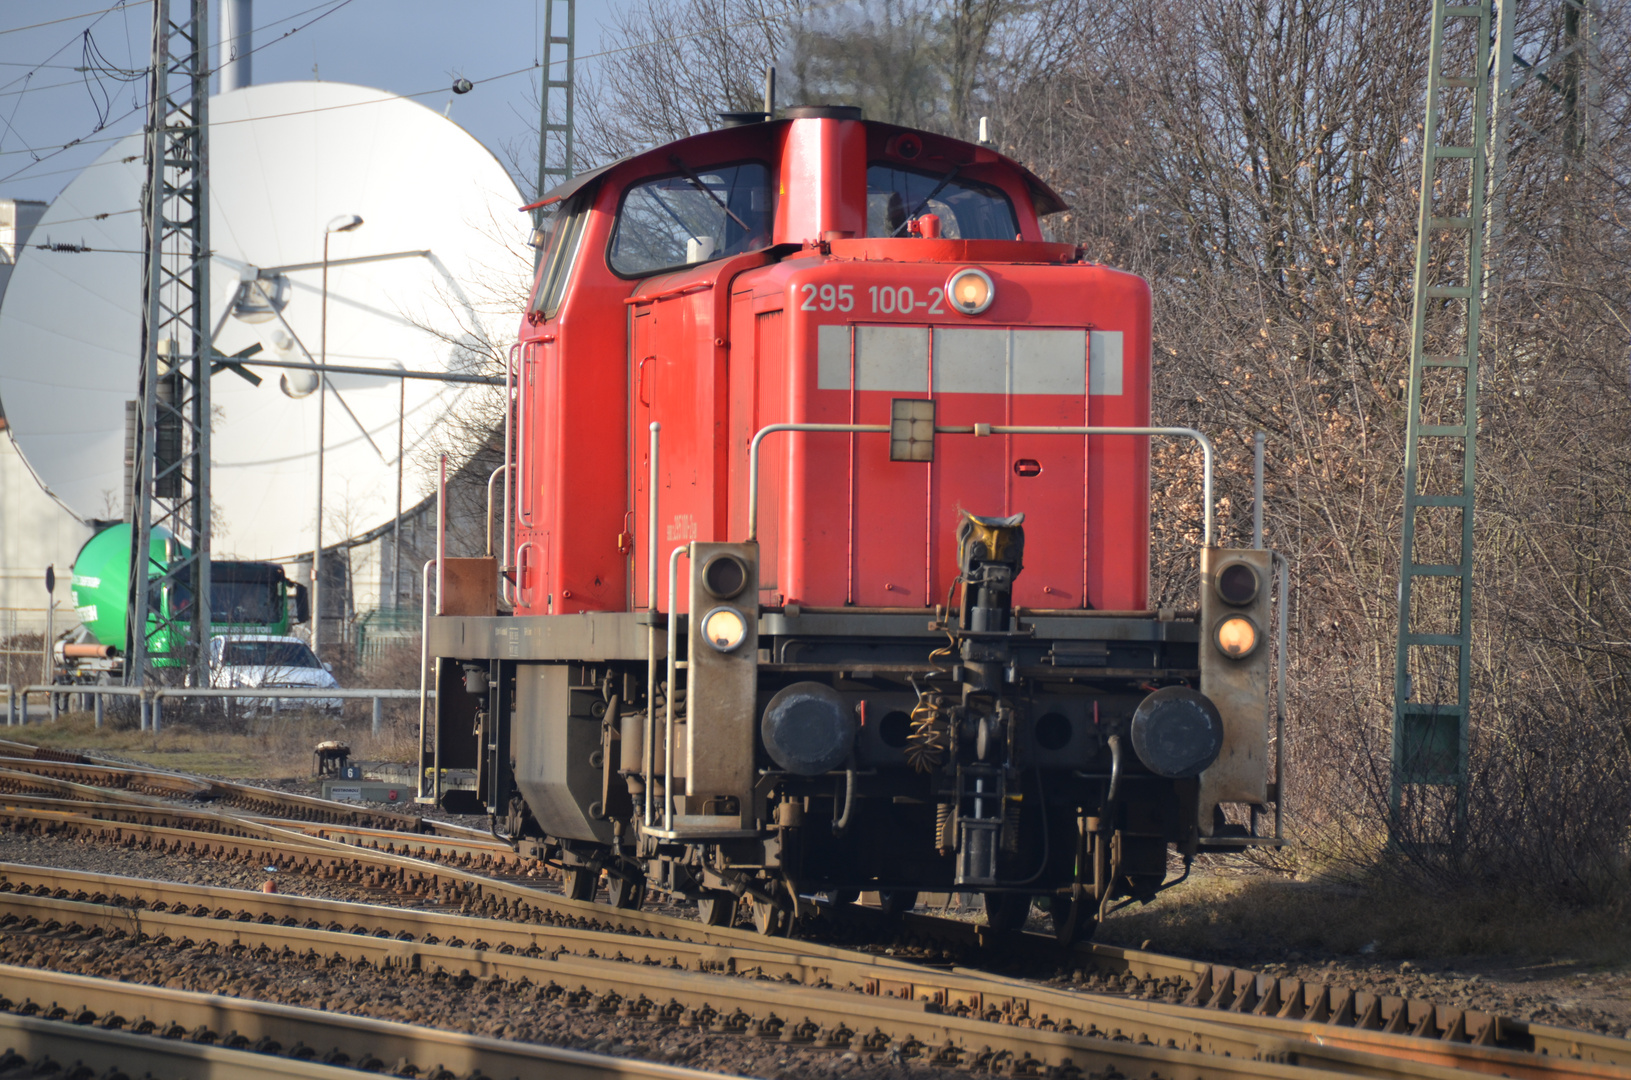 BR 295 100-2